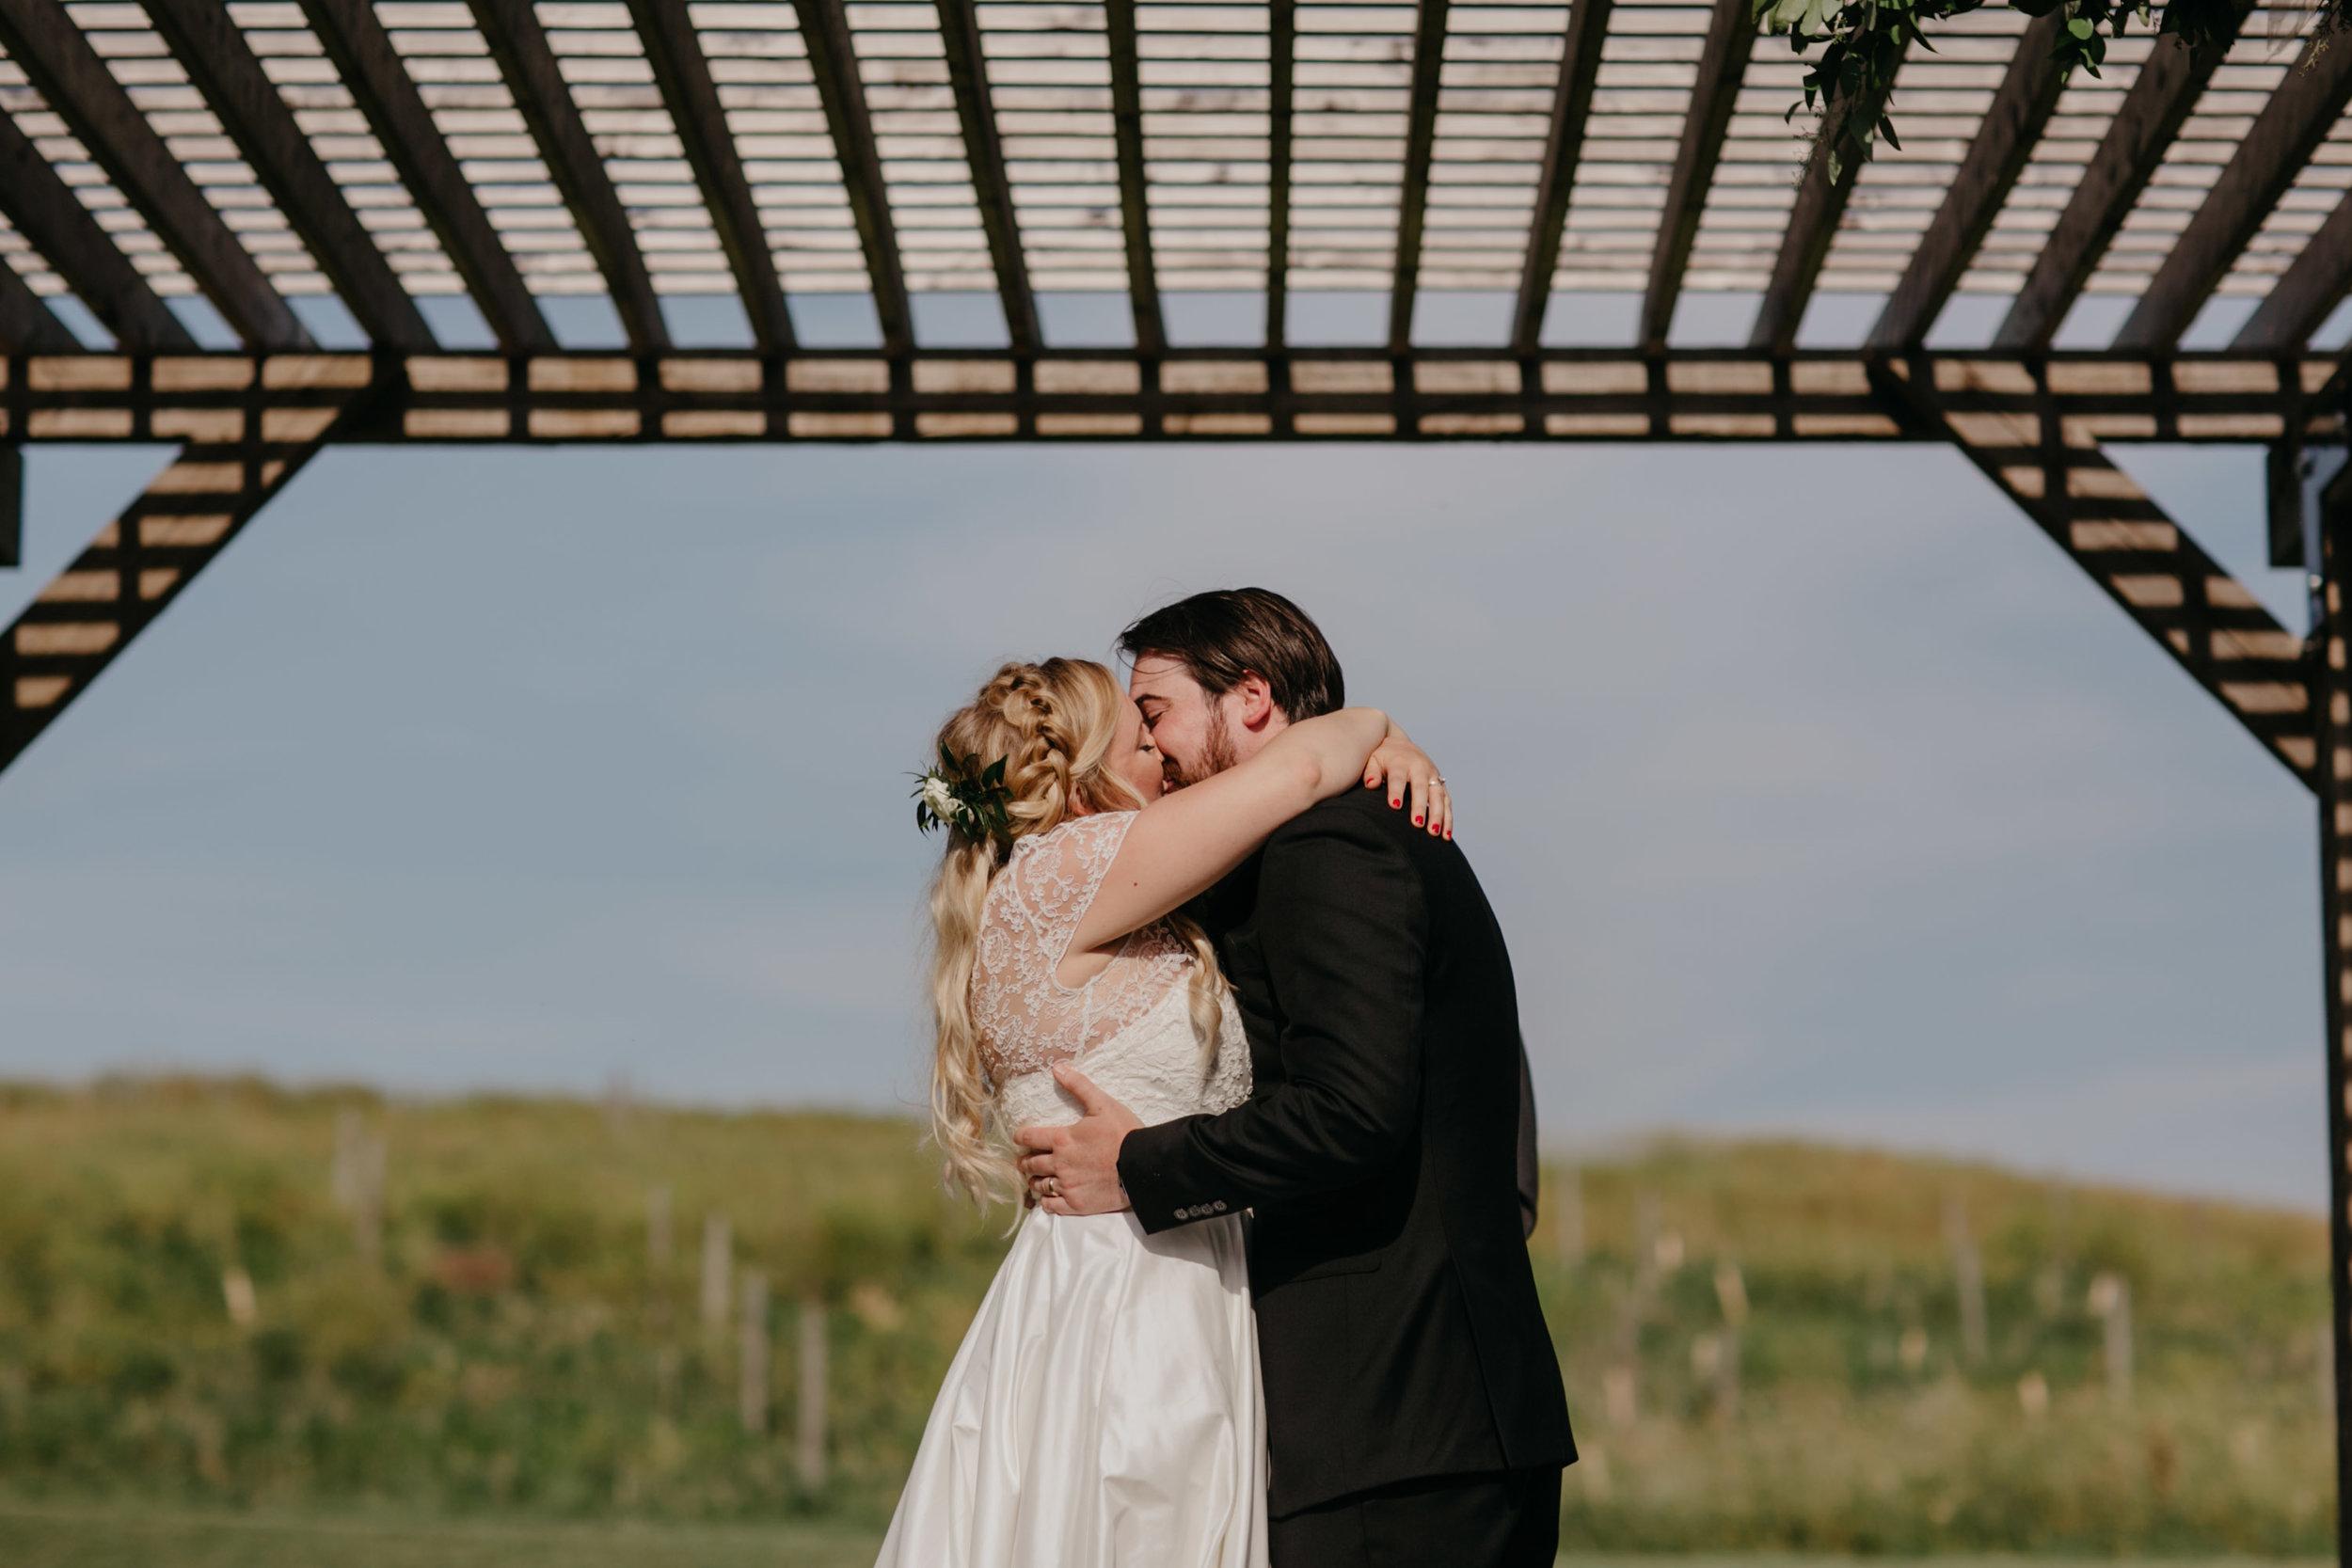 omaha-wedding-photographer_026.jpg